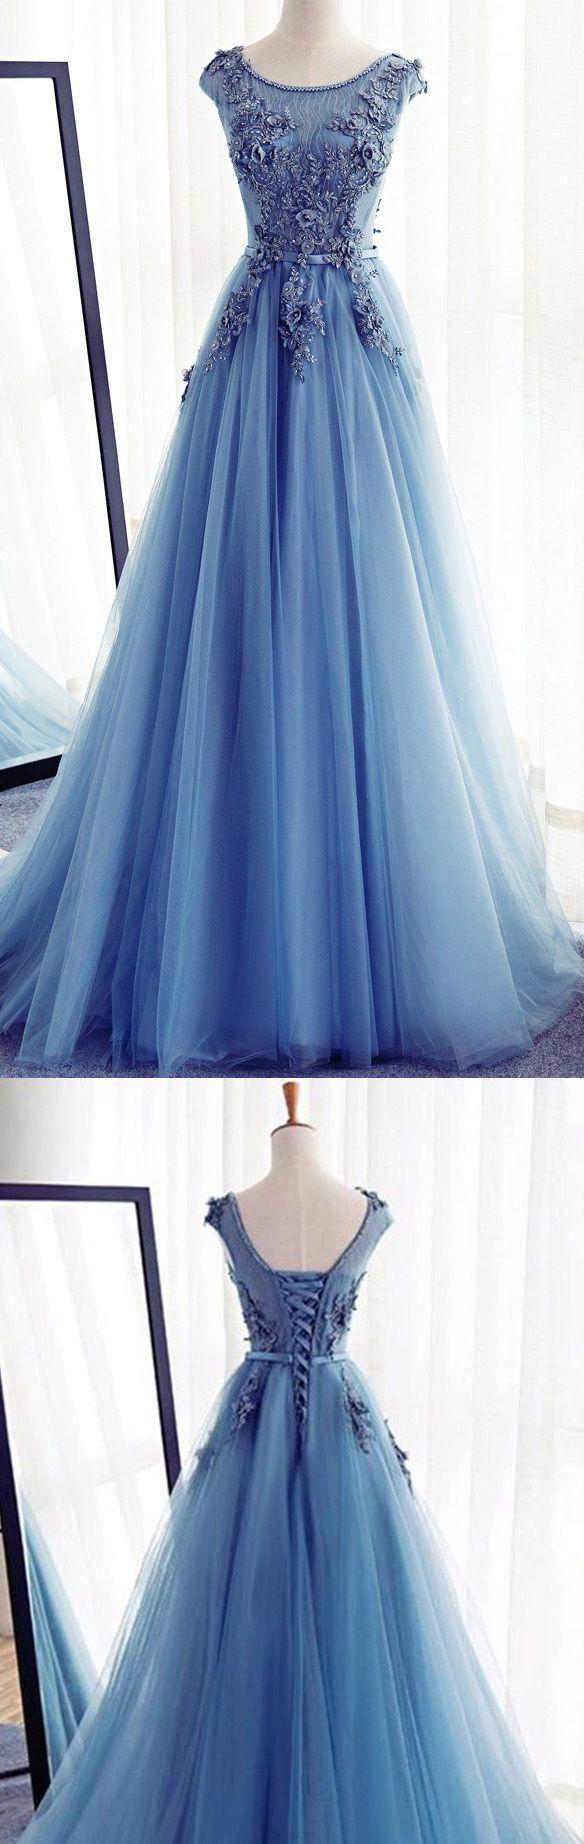 Blue Prom Dresses, Long Evening Dresses, Long Blue Evening Dresses ...